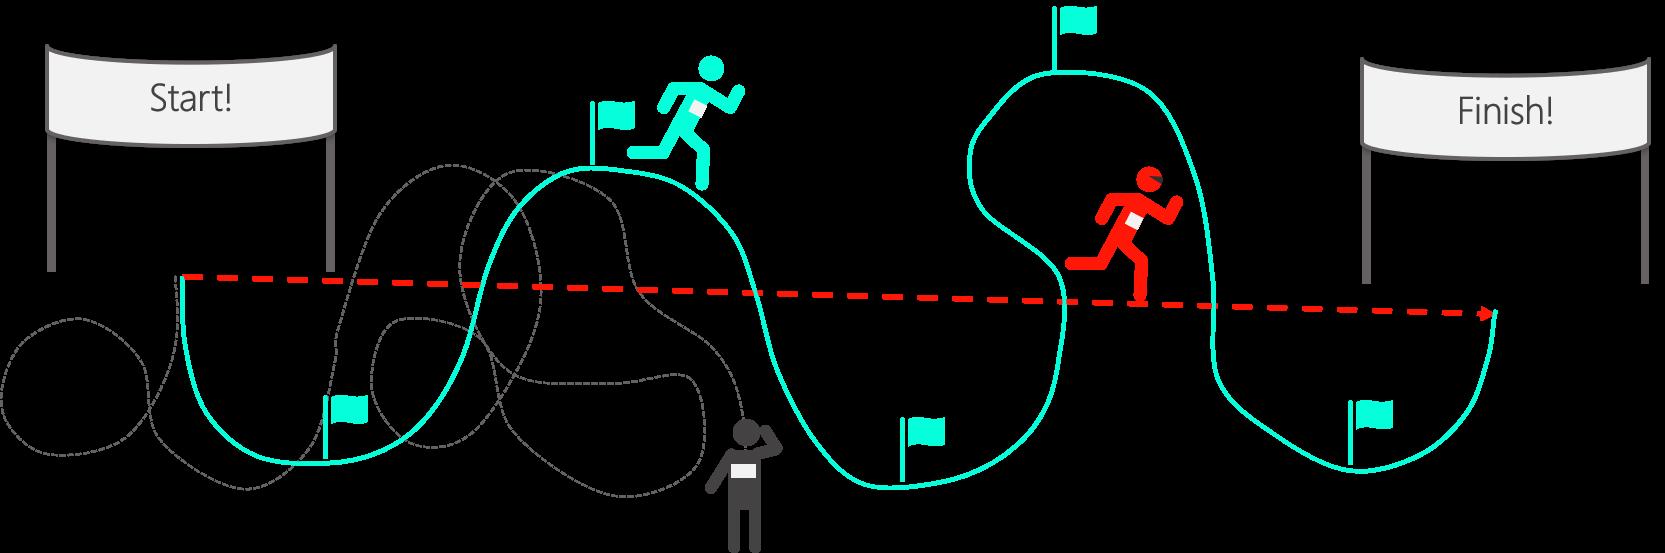 Process Mining Conformance Check Run Competition